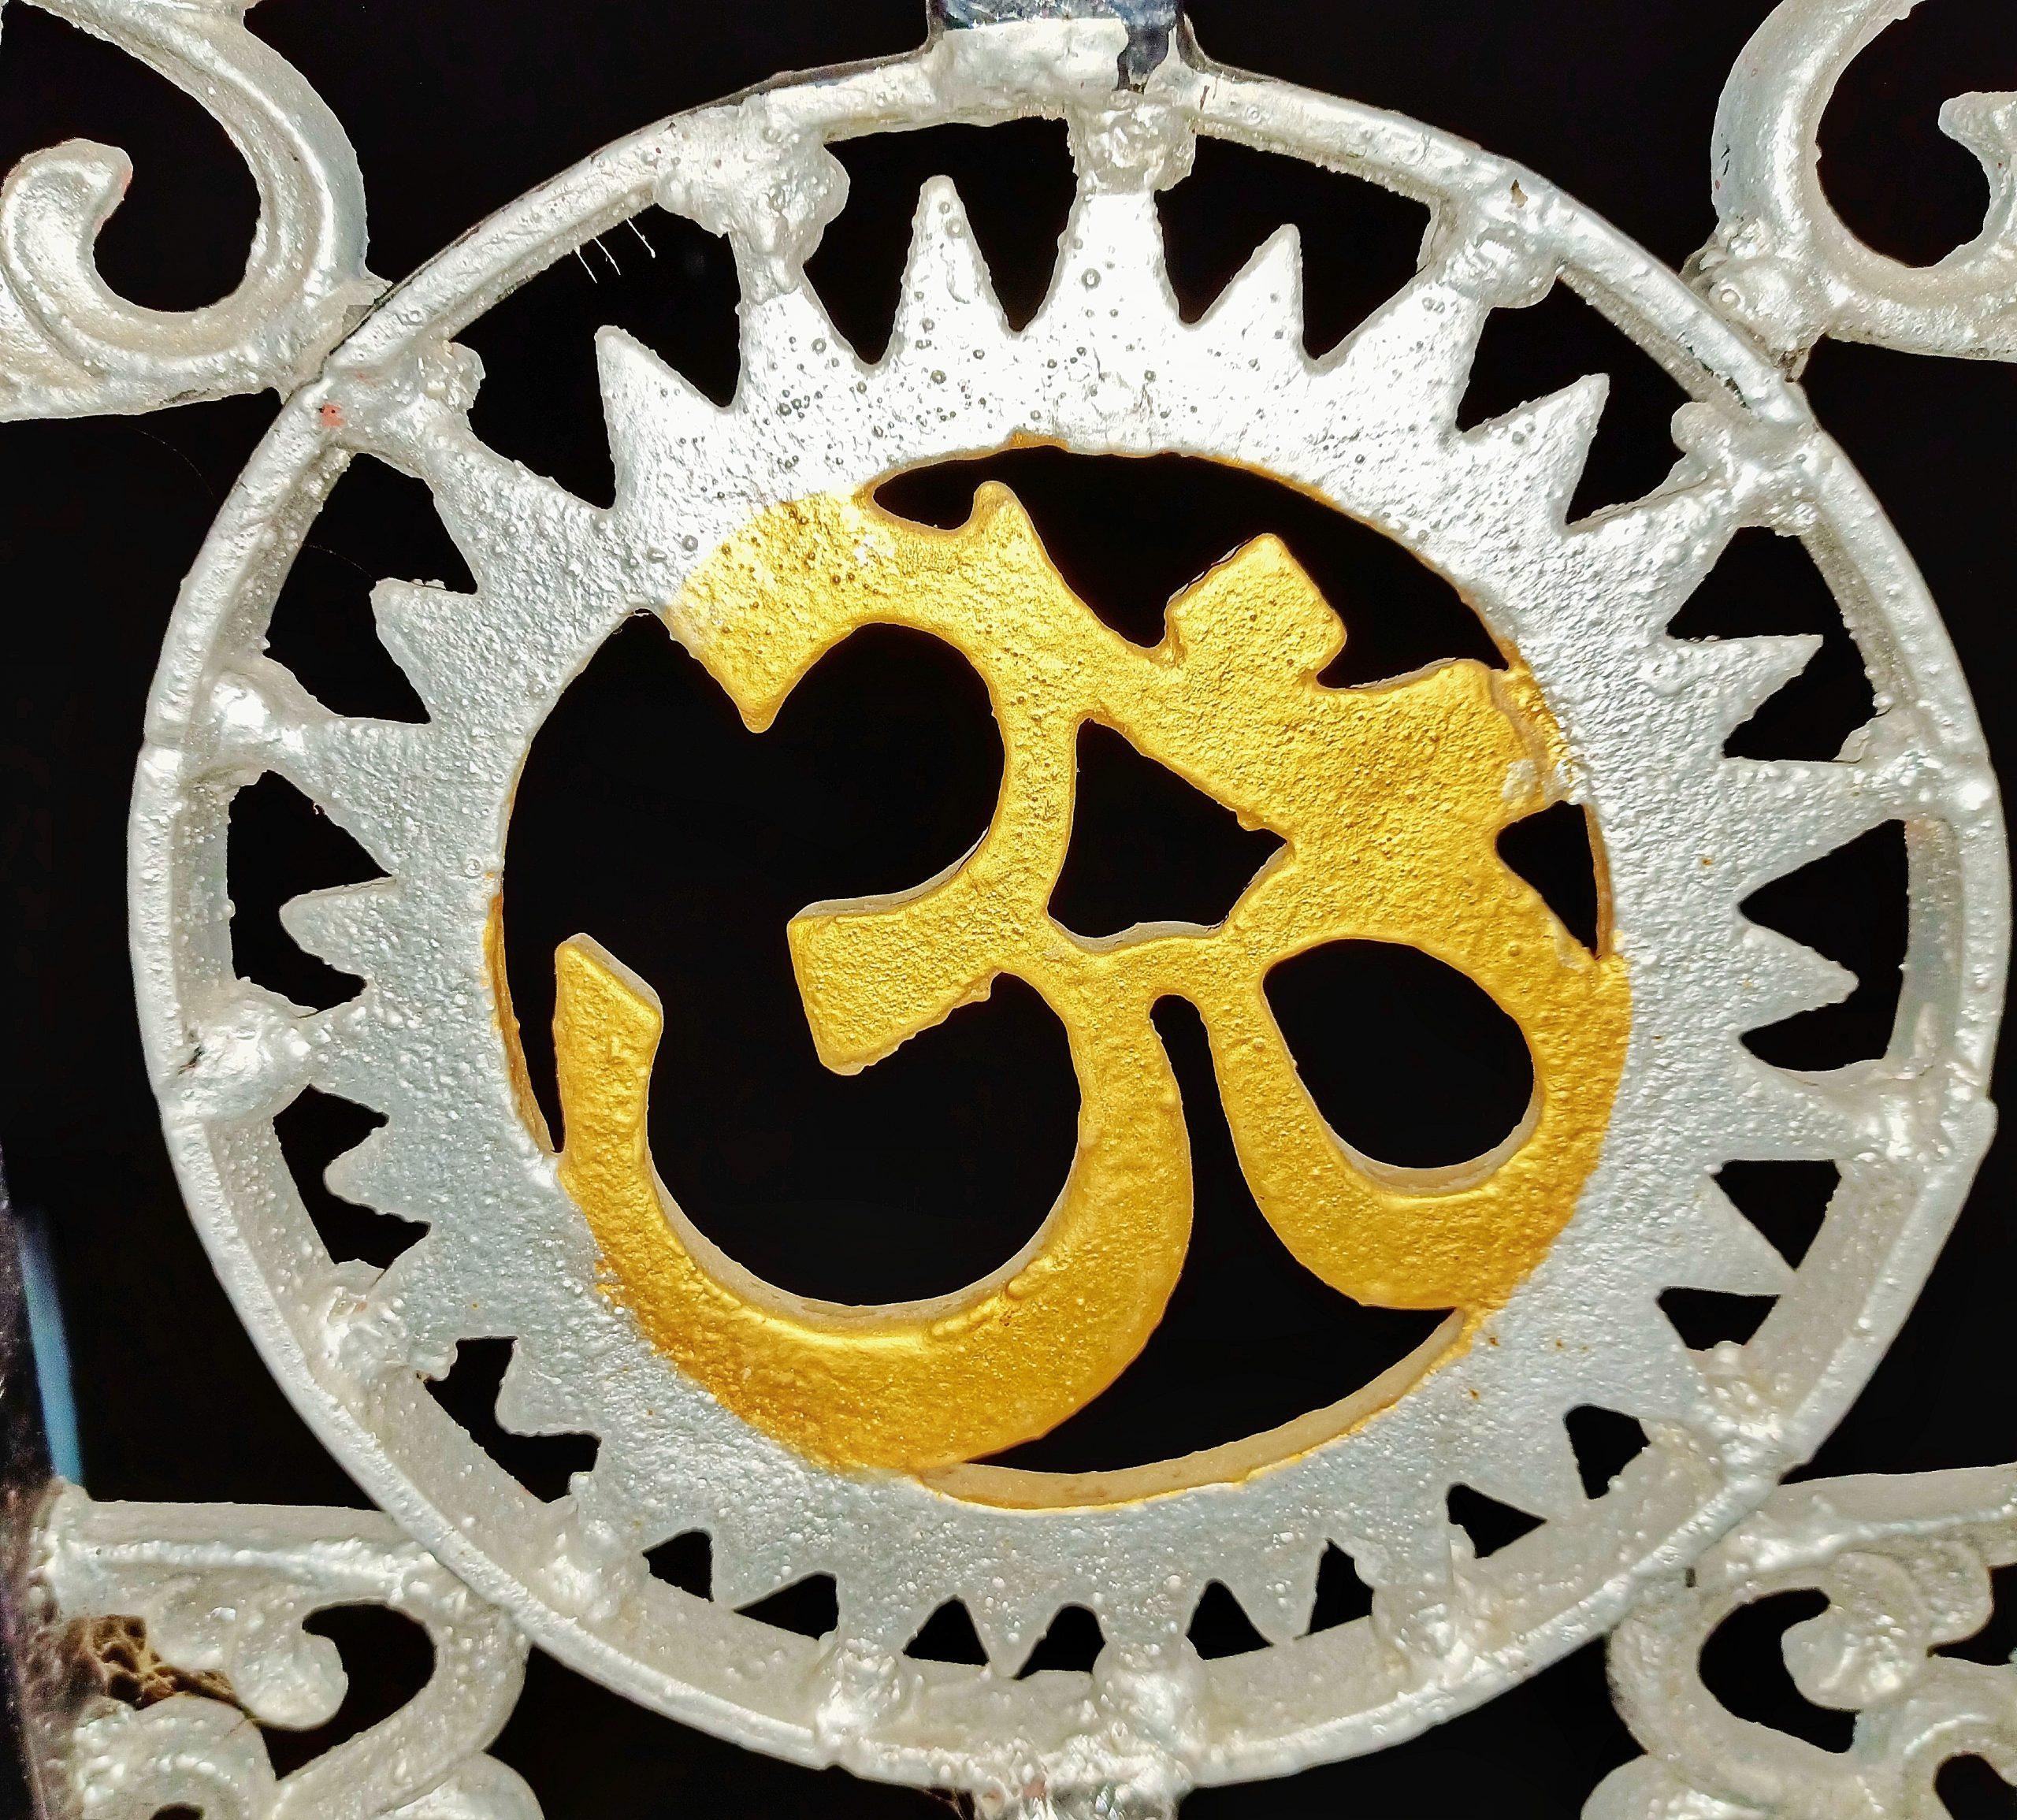 Om written on a metal structure